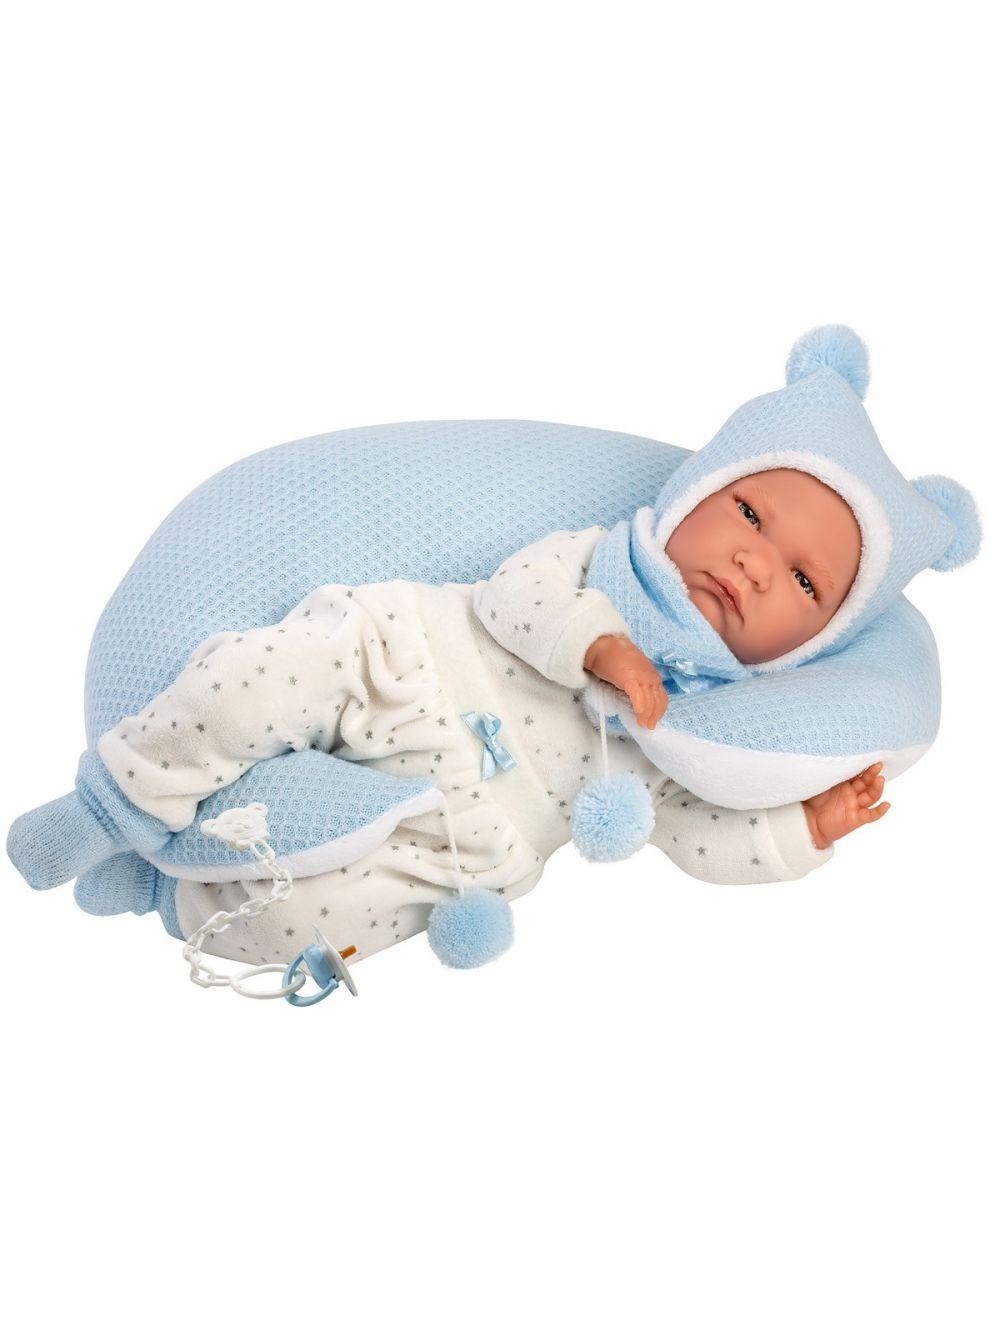 Llorens 74051 Lalka bobas Lalo płaczący 42 cm niebieska poduszka